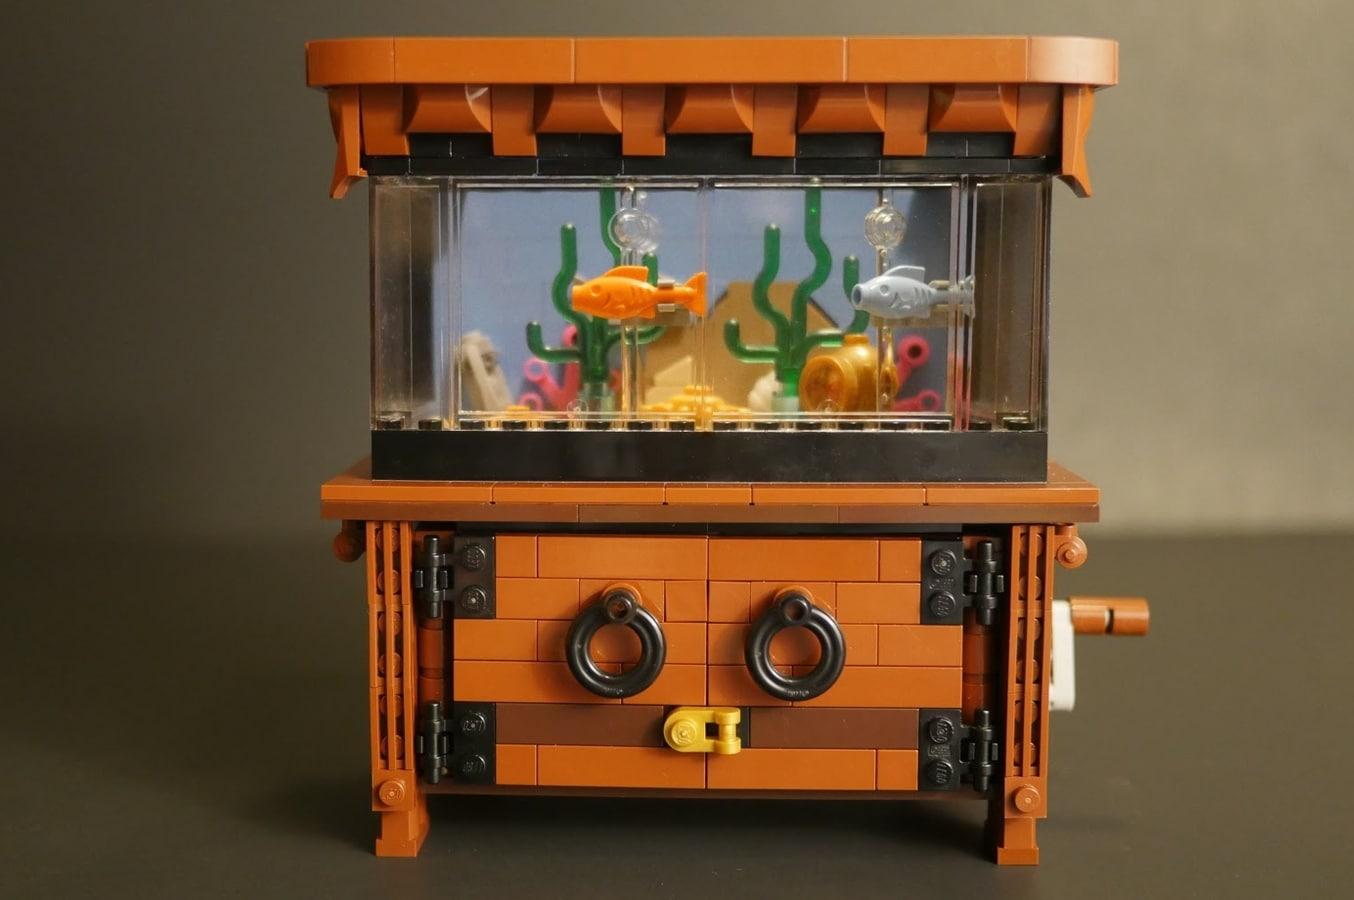 Das LEGO Aquarium hat was zu bieten. (Foto: LEGO Ideas)